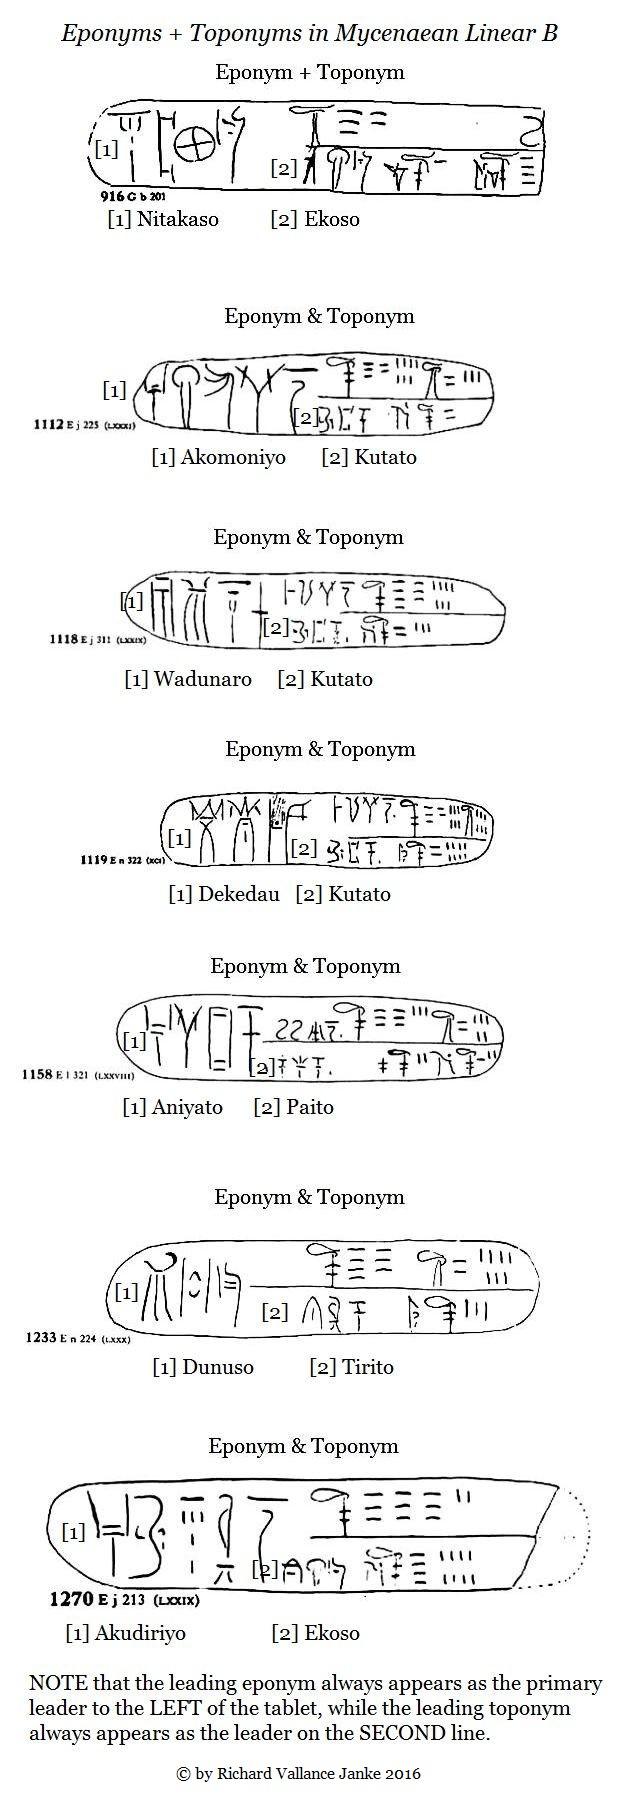 Eponyms + Toponyms in Mycenaean Linear B